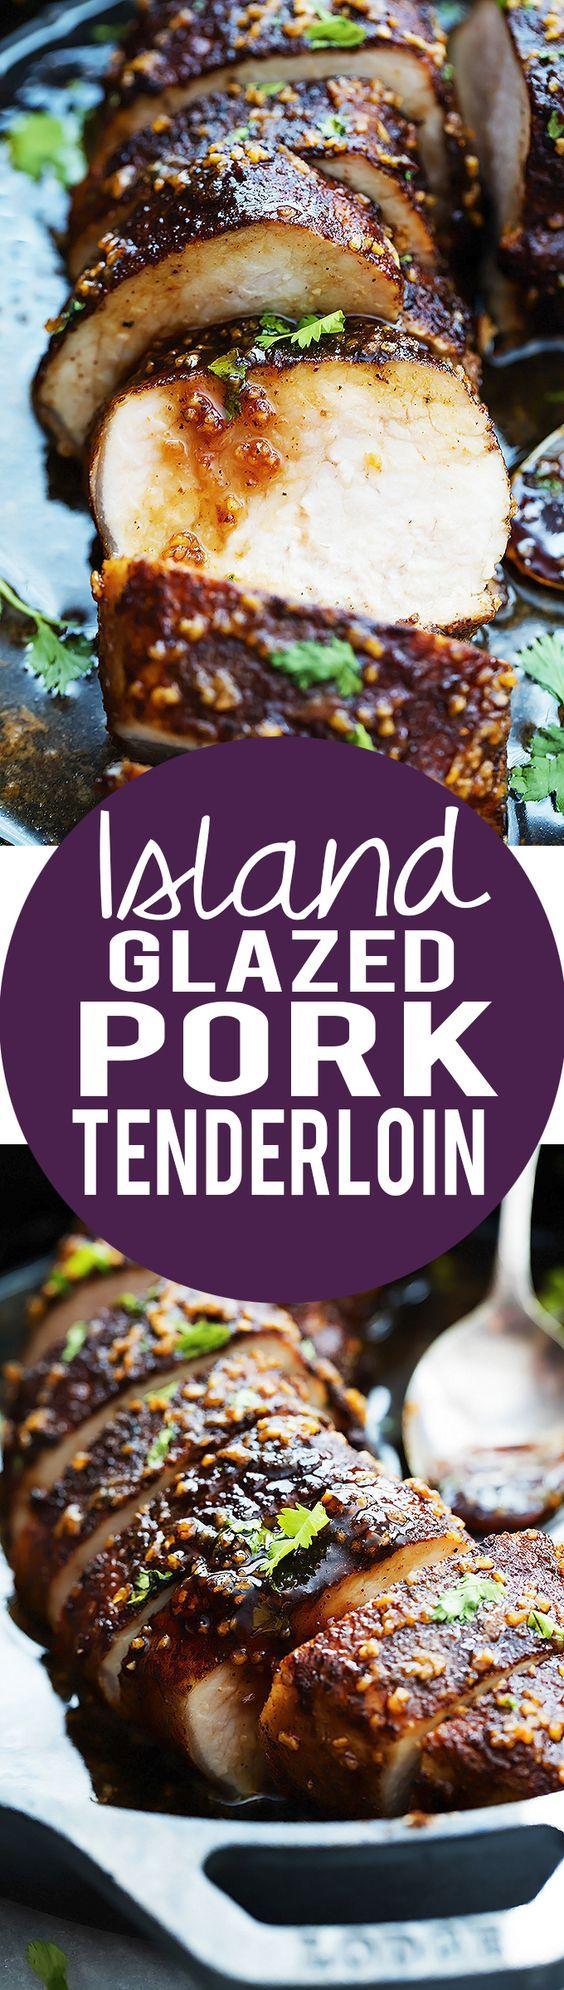 30-minute Island Glazed Pork Tenderloin | Creme de la Crumb